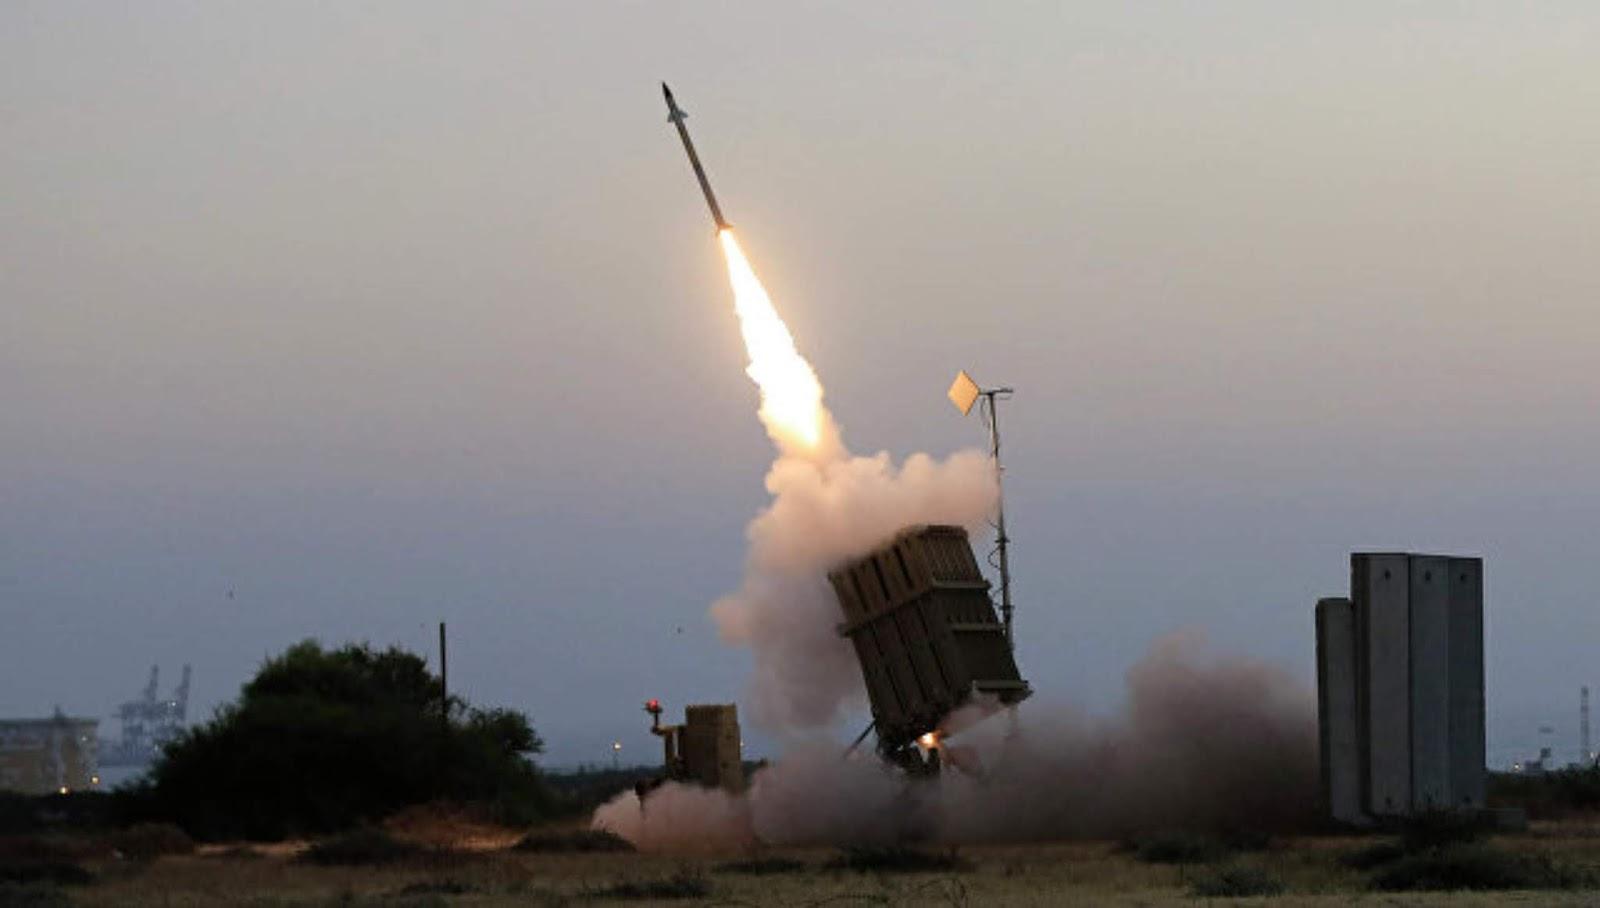 AS mungkin menciptakan rudal yang dilarang INF, Eropa di ambang kembalinya Perang Dingin